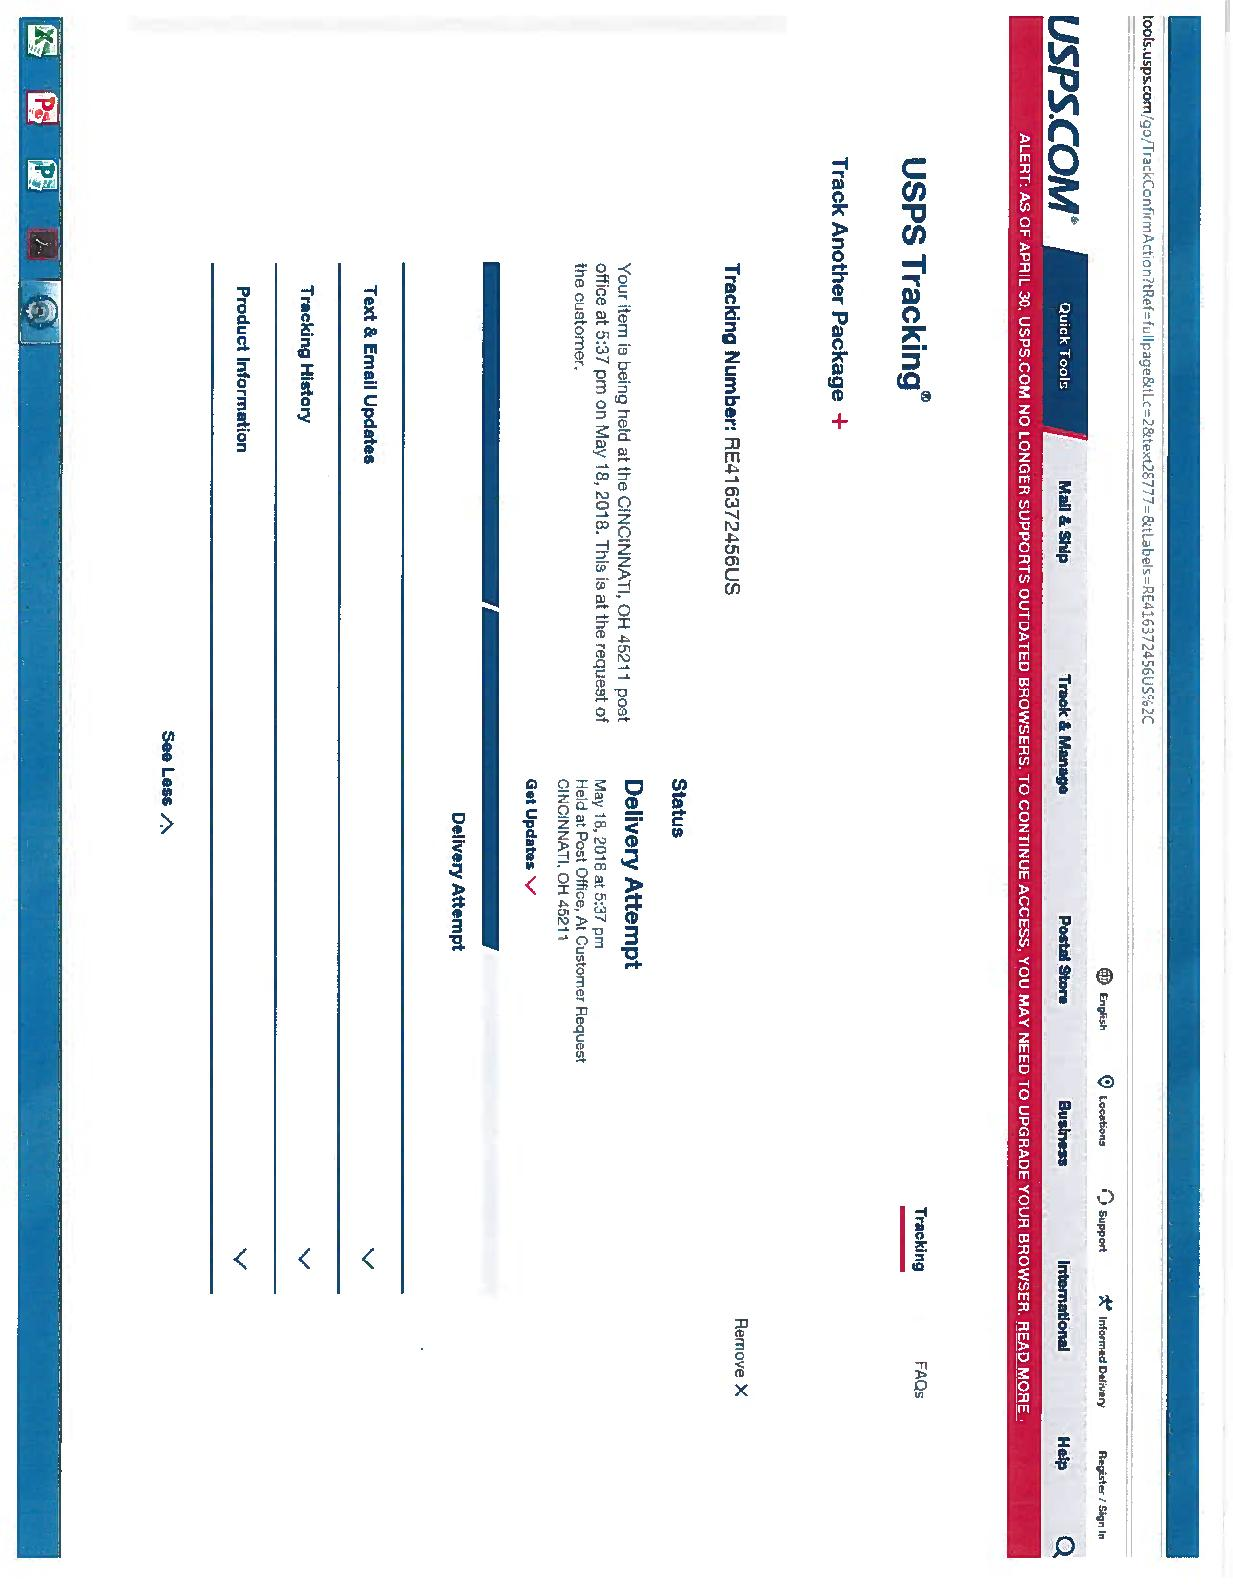 Calaméo - Affidavit of Facts RV Bey Publications Refusal May 15 ,2018